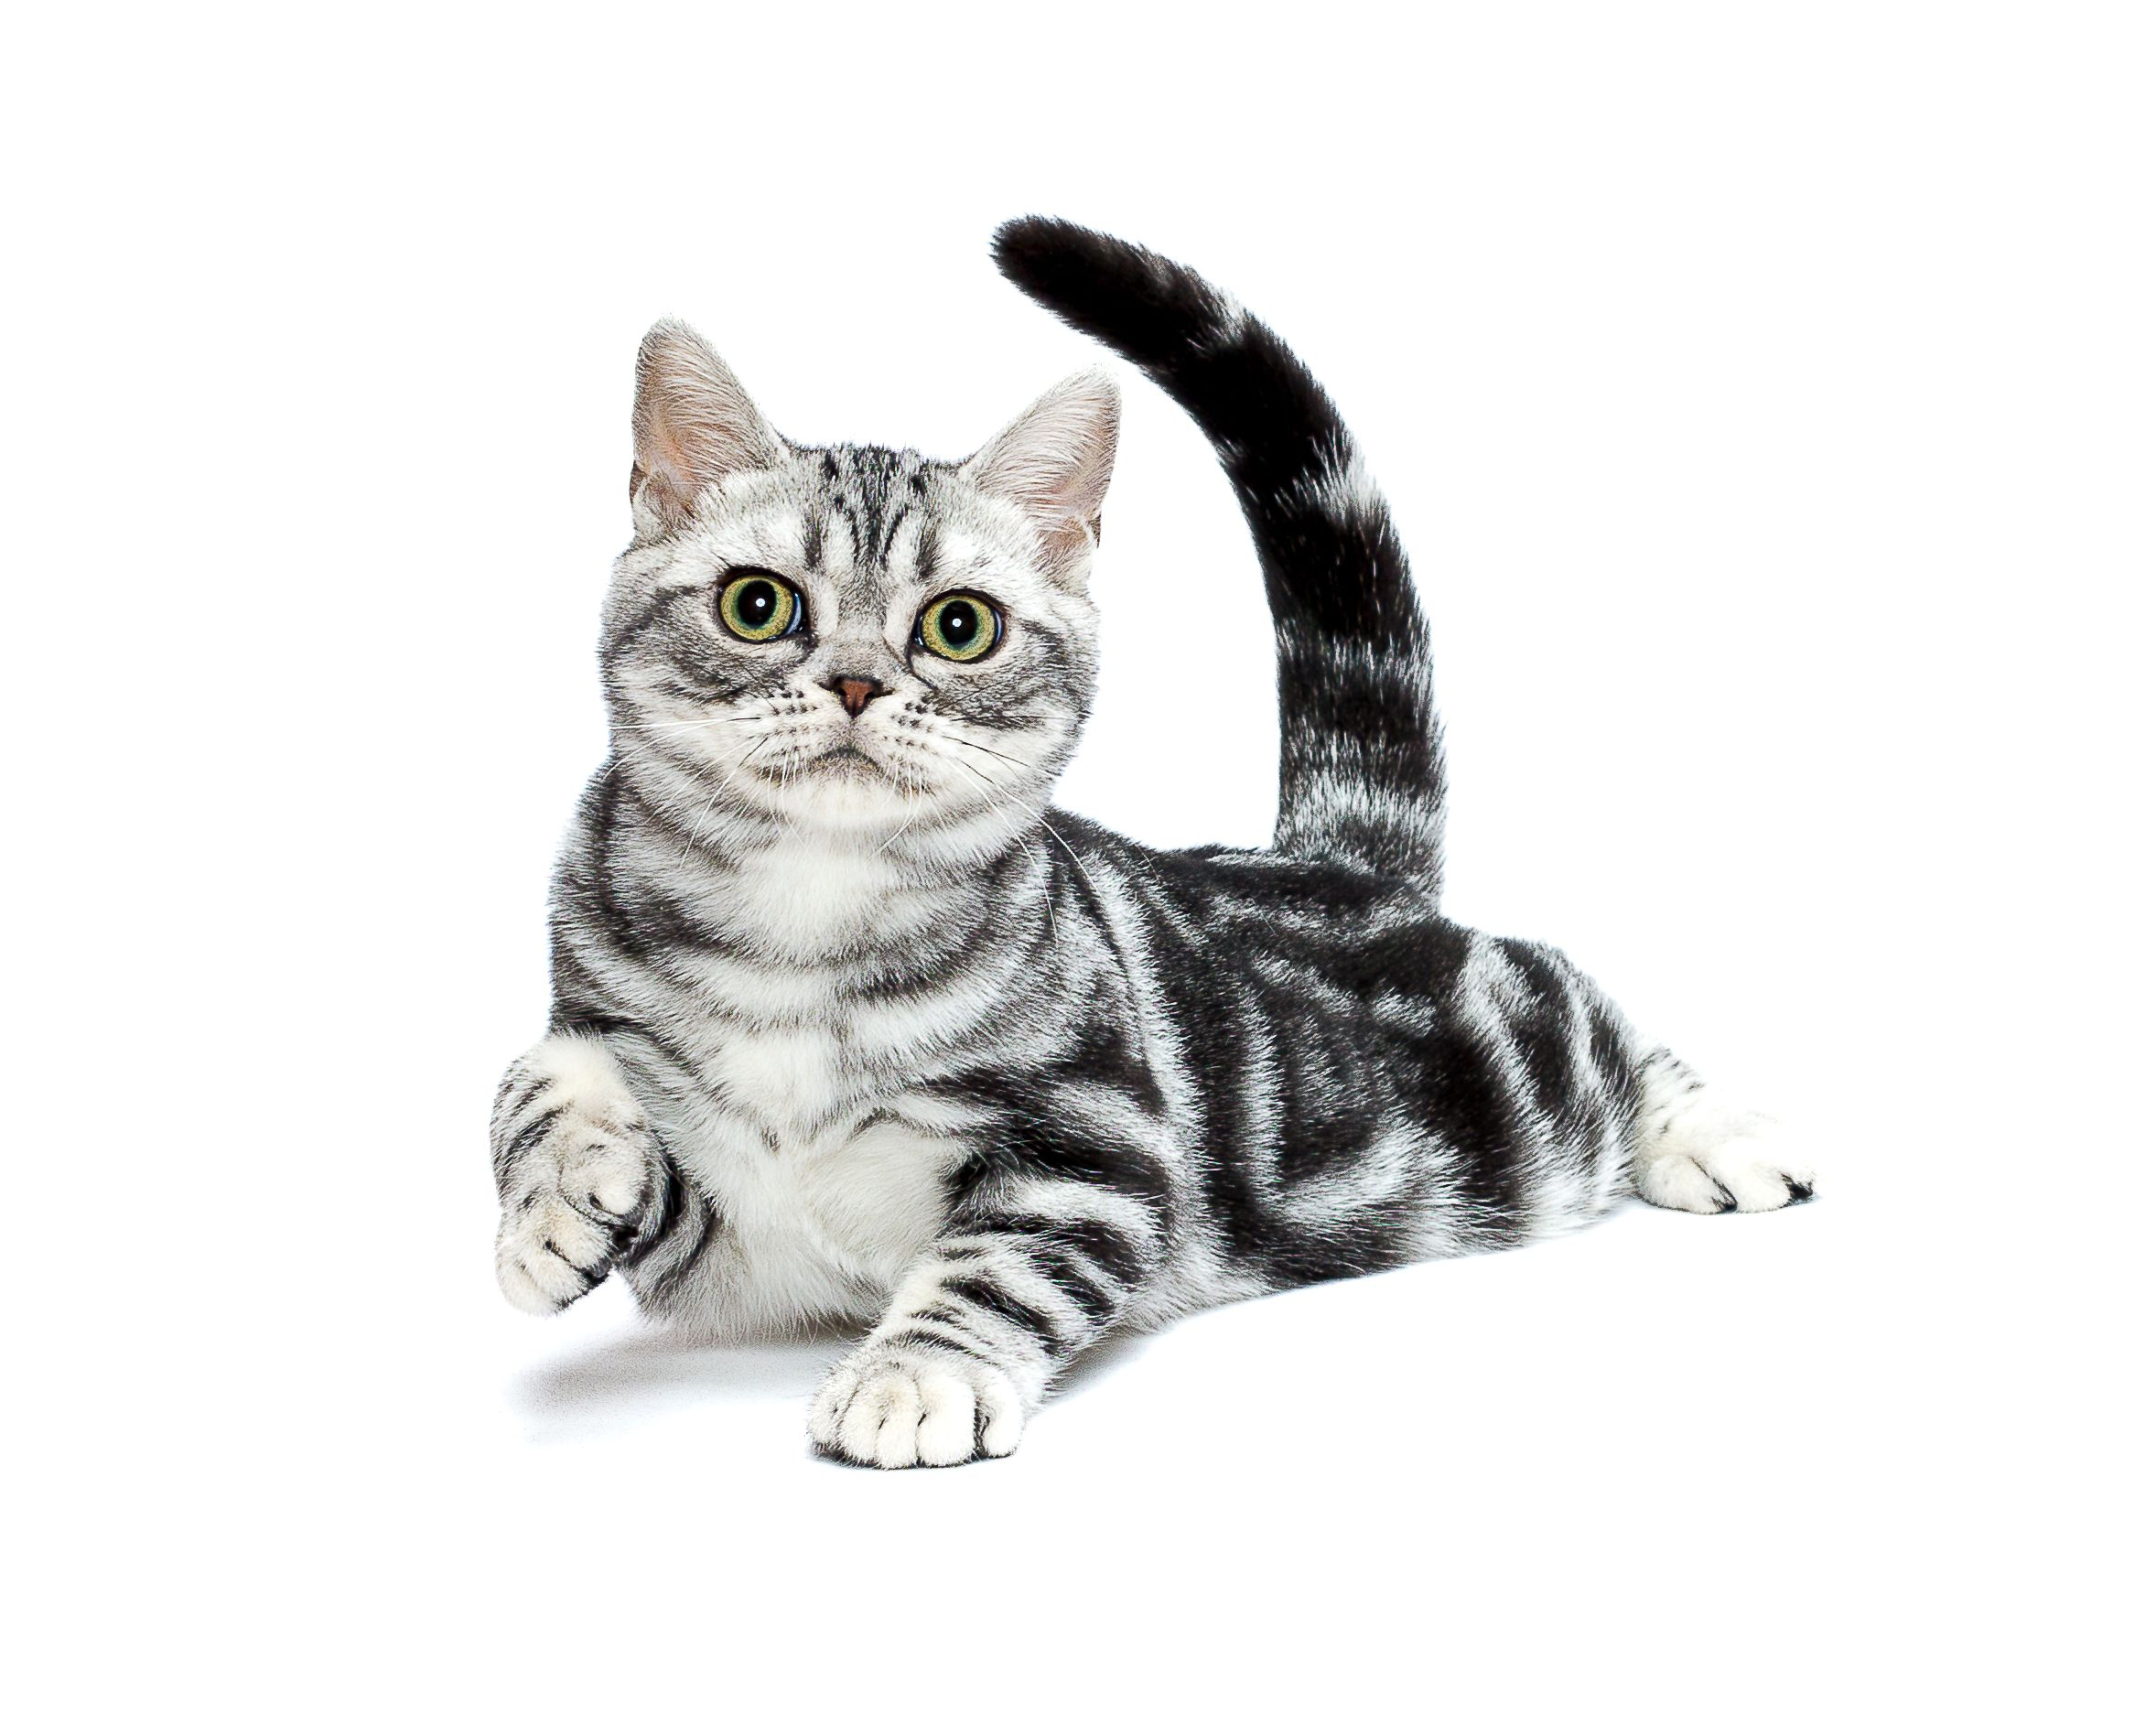 Antonio American Shorthair Kitten American Shorthair Silver Tabby Kitten